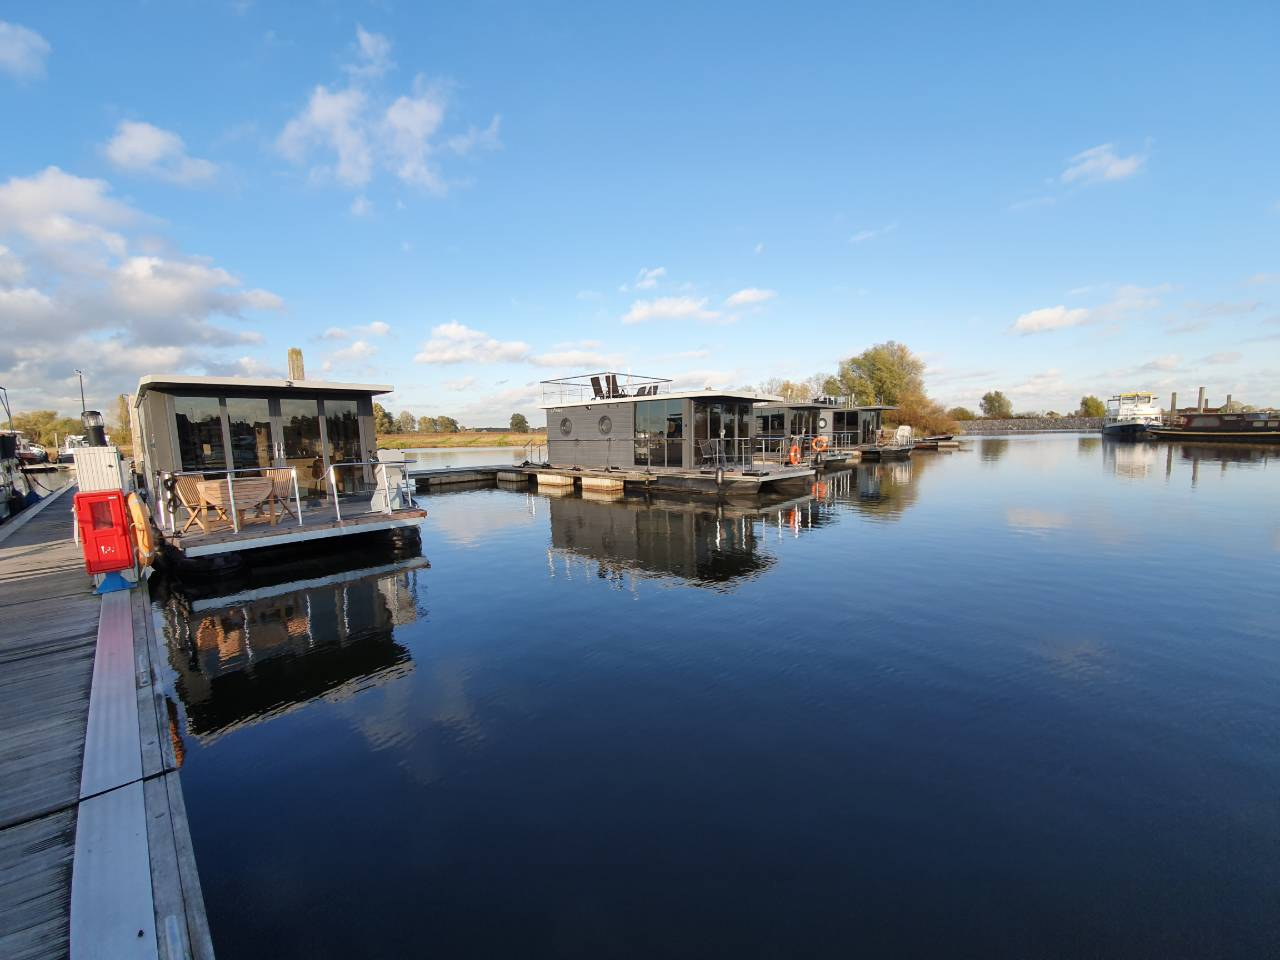 hausboot mieten maasplassen roermond otter easy houseboats. Black Bedroom Furniture Sets. Home Design Ideas